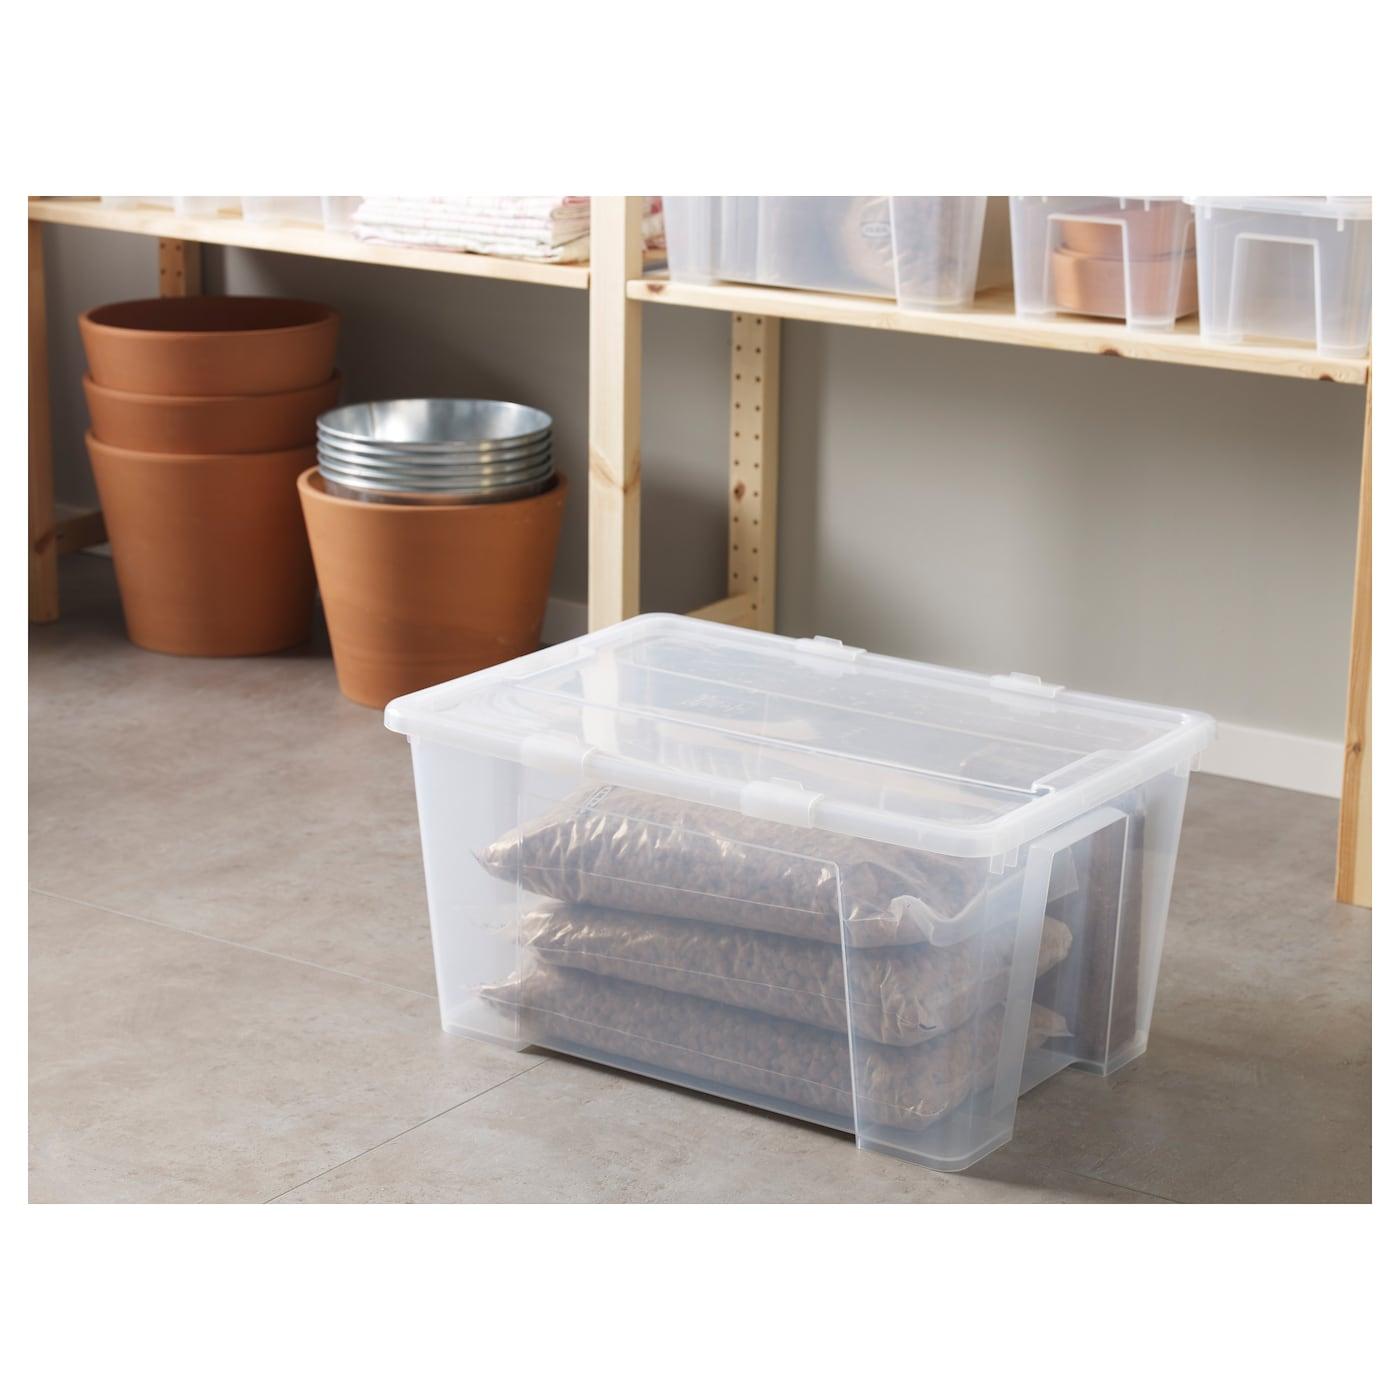 ikea cajas de ordenacion negras fondo 45cm